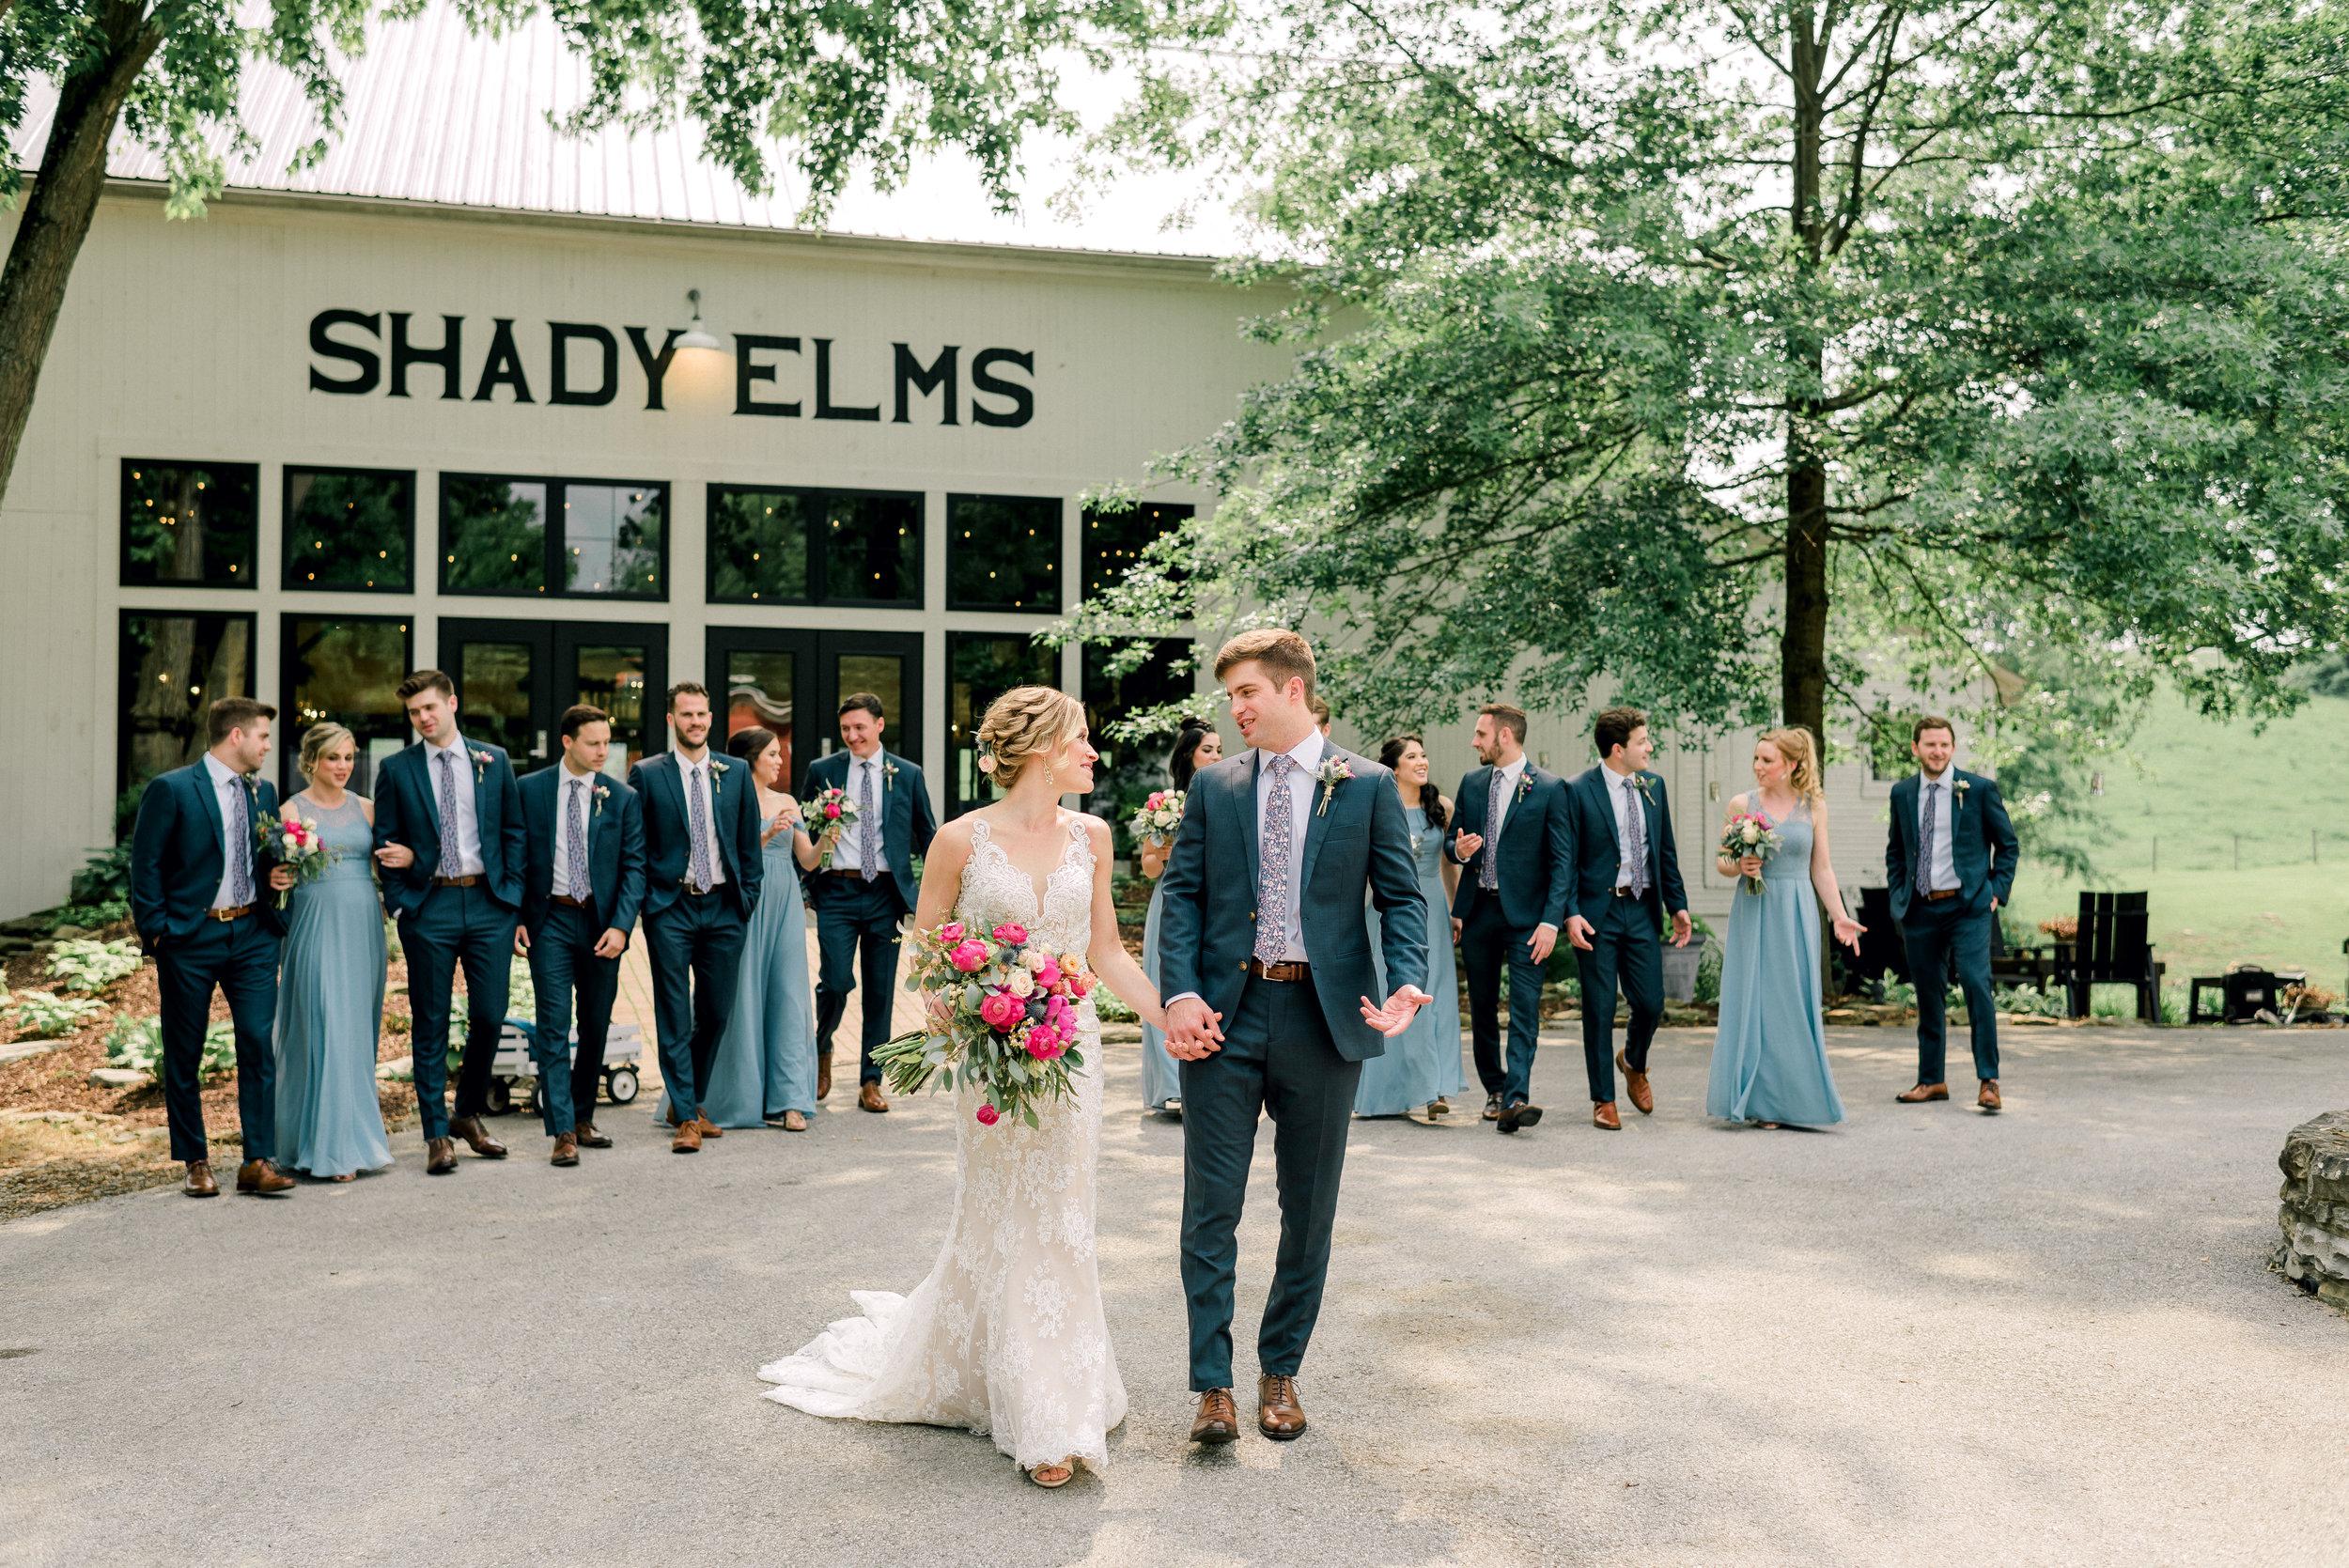 pittsburgh-wedding-photographer-shady-elms-farm-0023.jpg